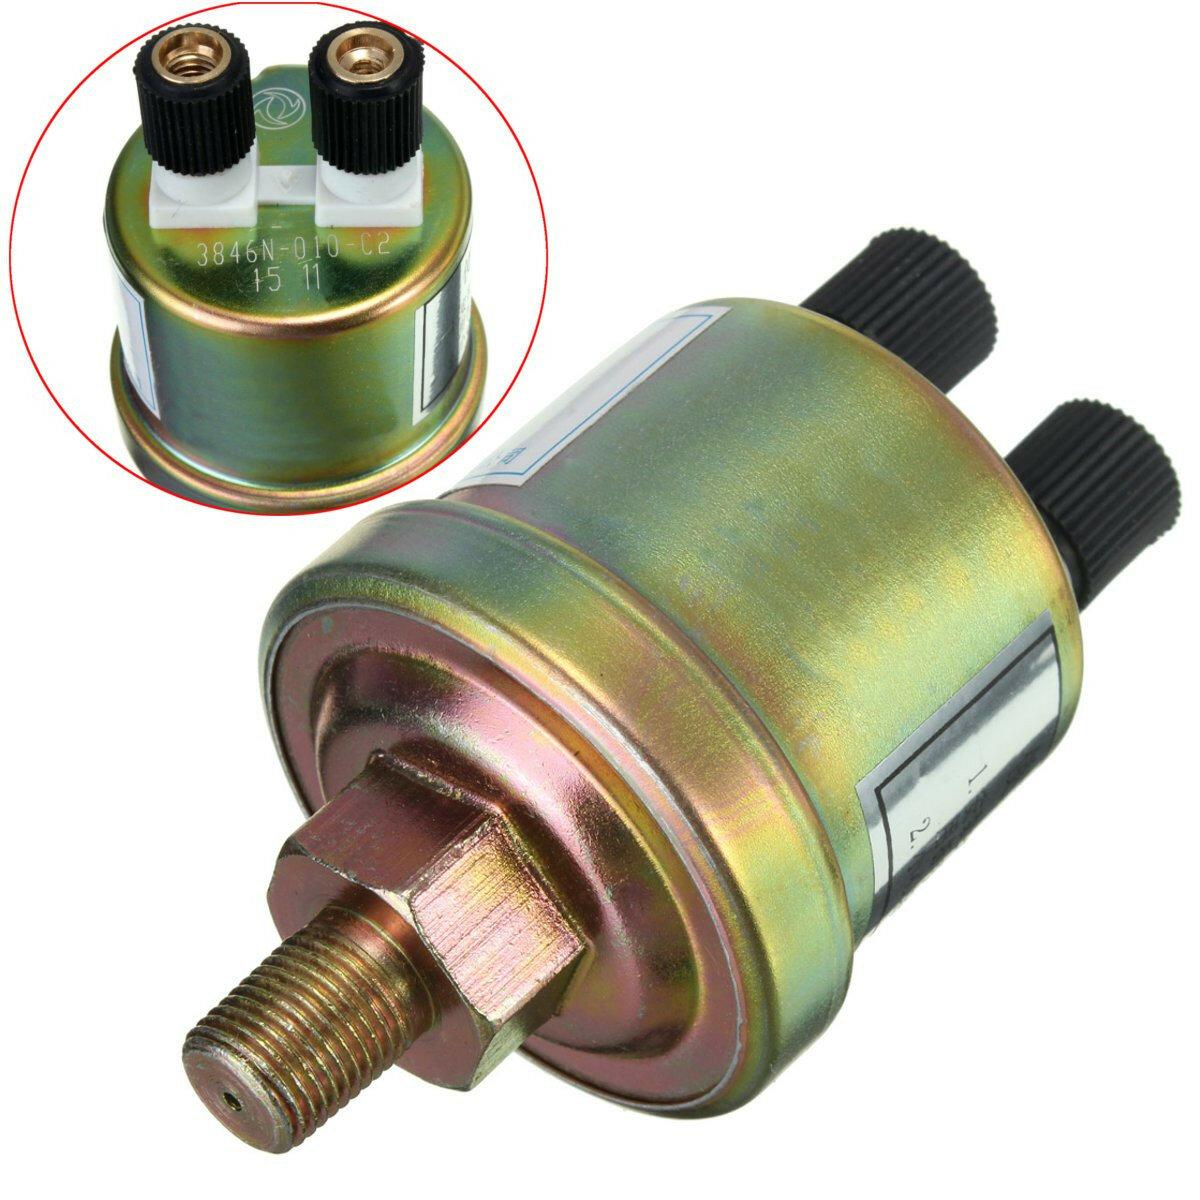 Oil Pressure Sensor >> 1 8 Npt Oil Pressure Sensor Engine Oil Pressure Switch Sensor Gauge Sender